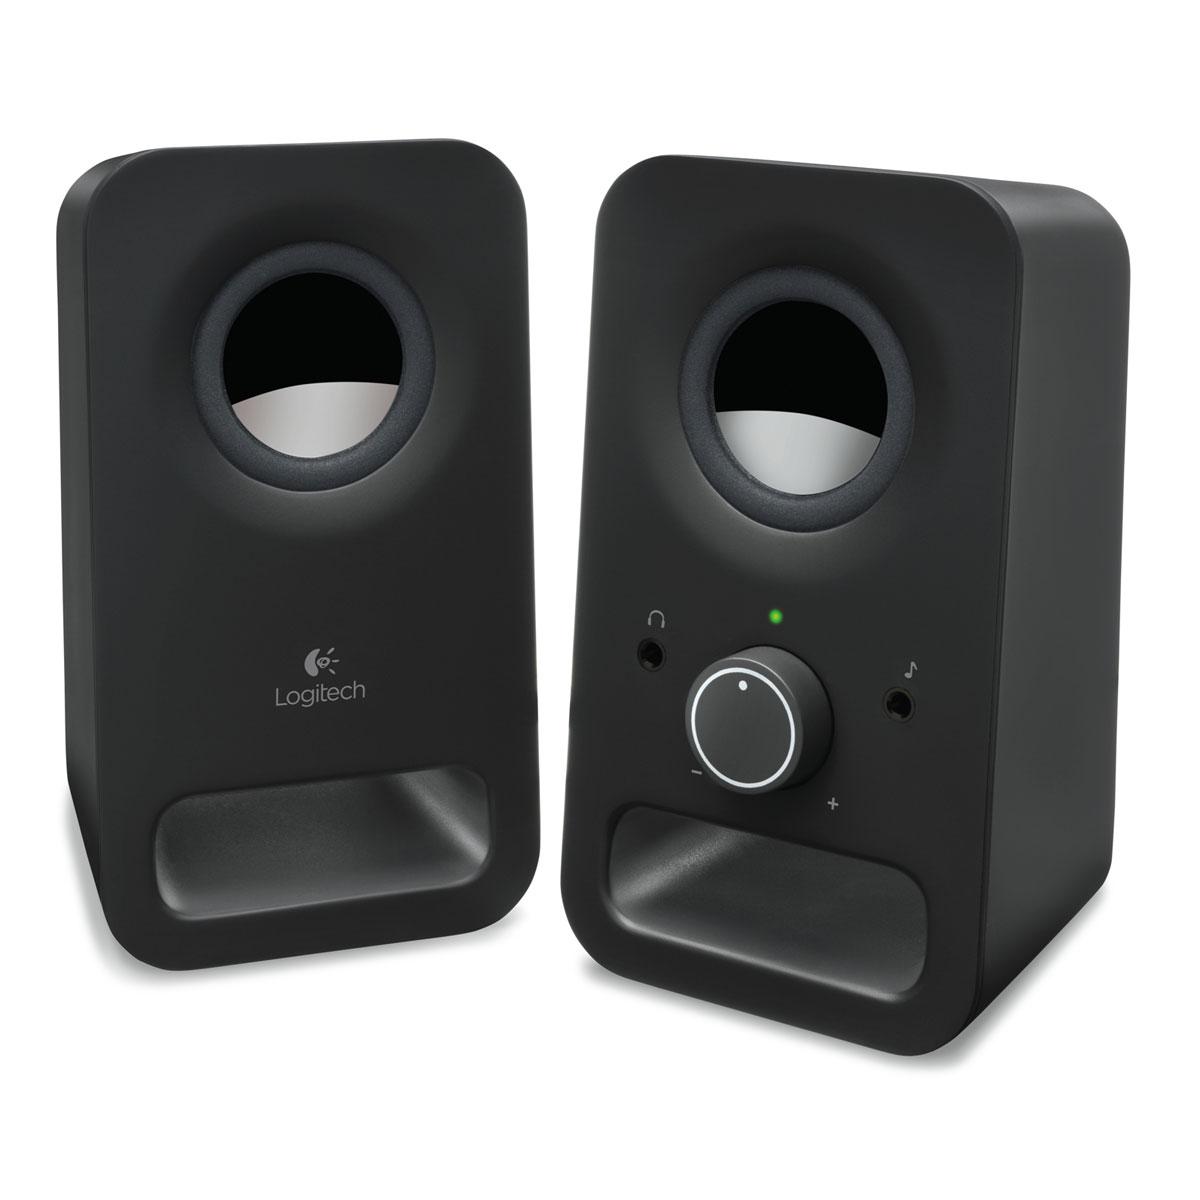 Enceinte Logitech Z150 - Noir - 980-000814